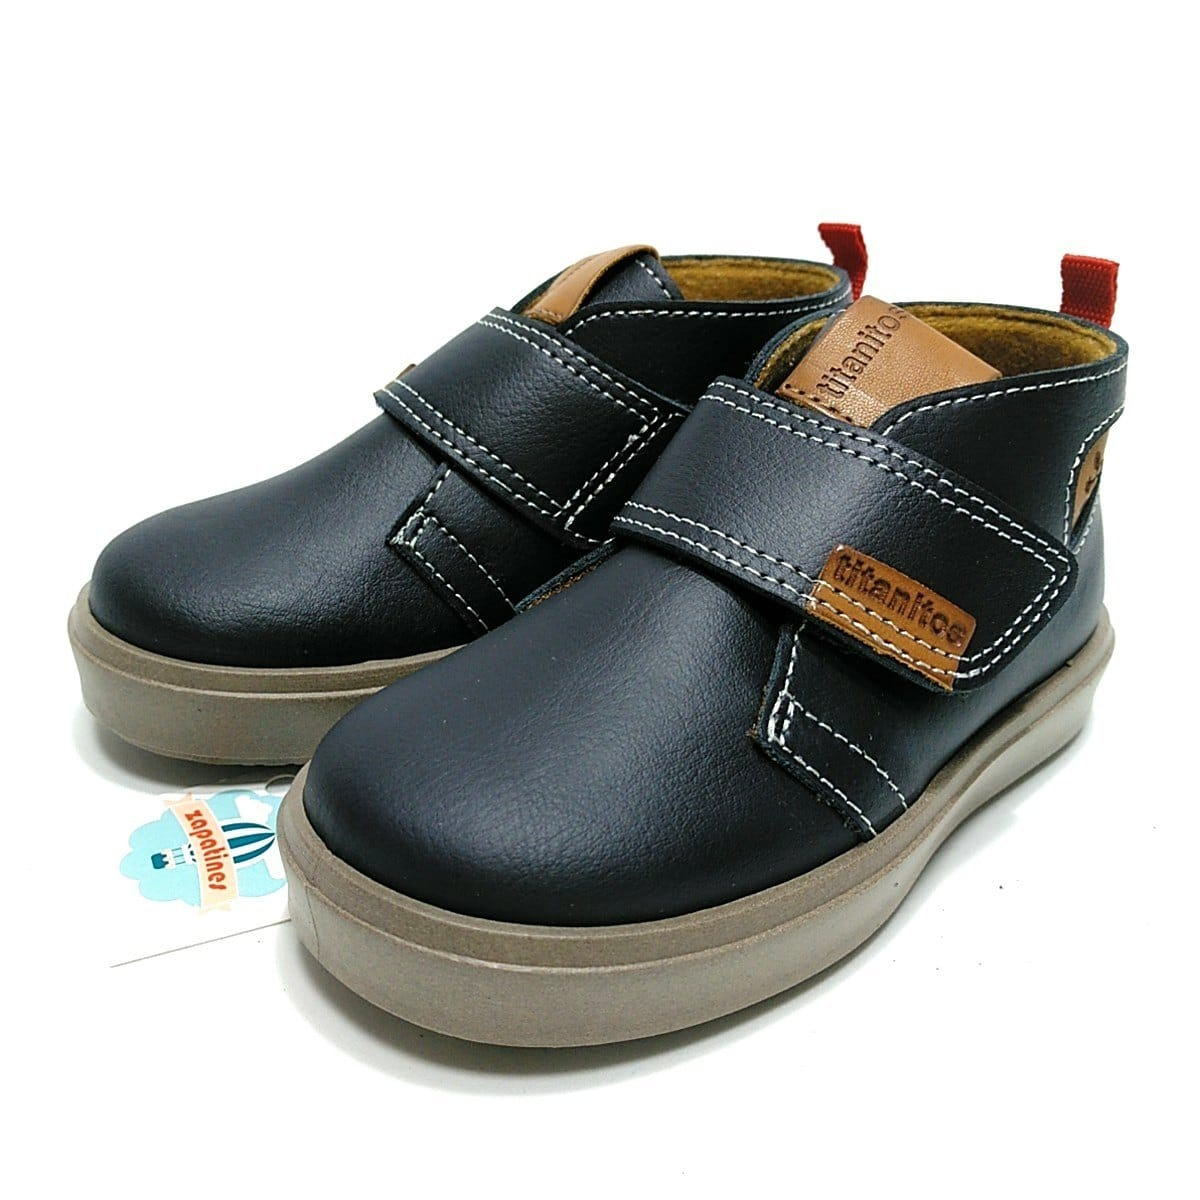 2a6cae689 Titanitos bota piel lavable marino velcro para niños   Zapatines